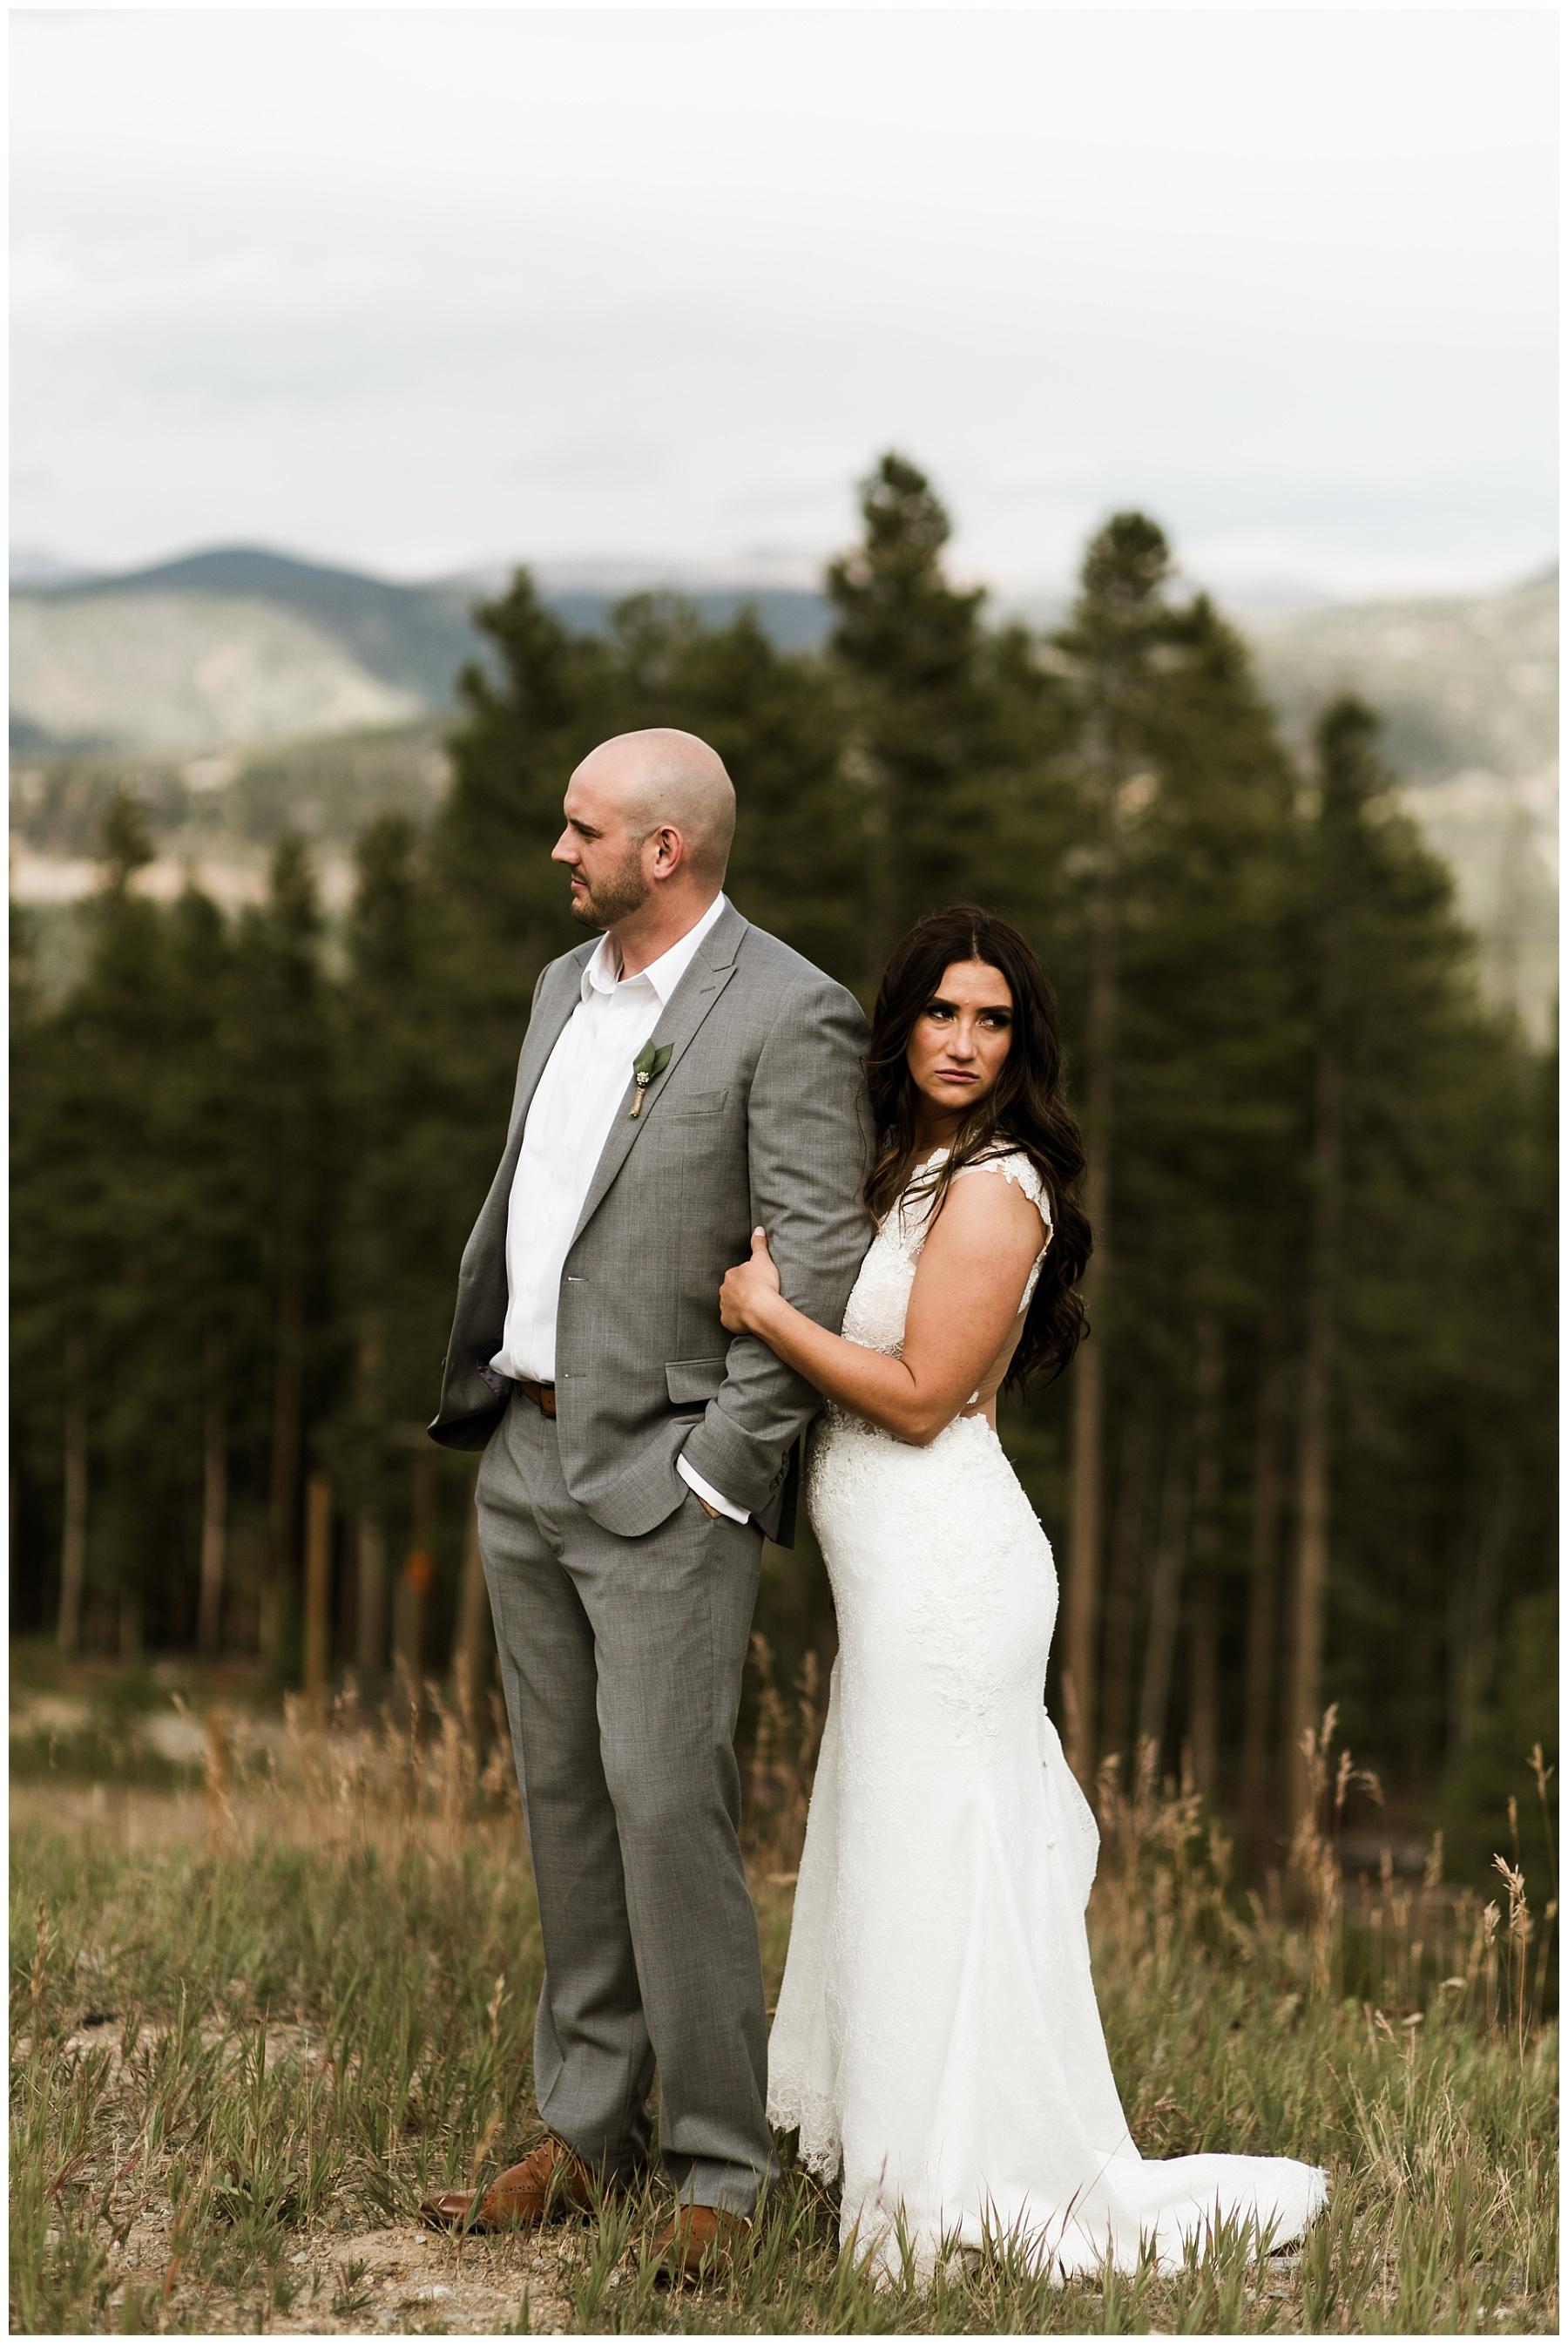 Katesalleyphotography-221_married in Breckenridge.jpg